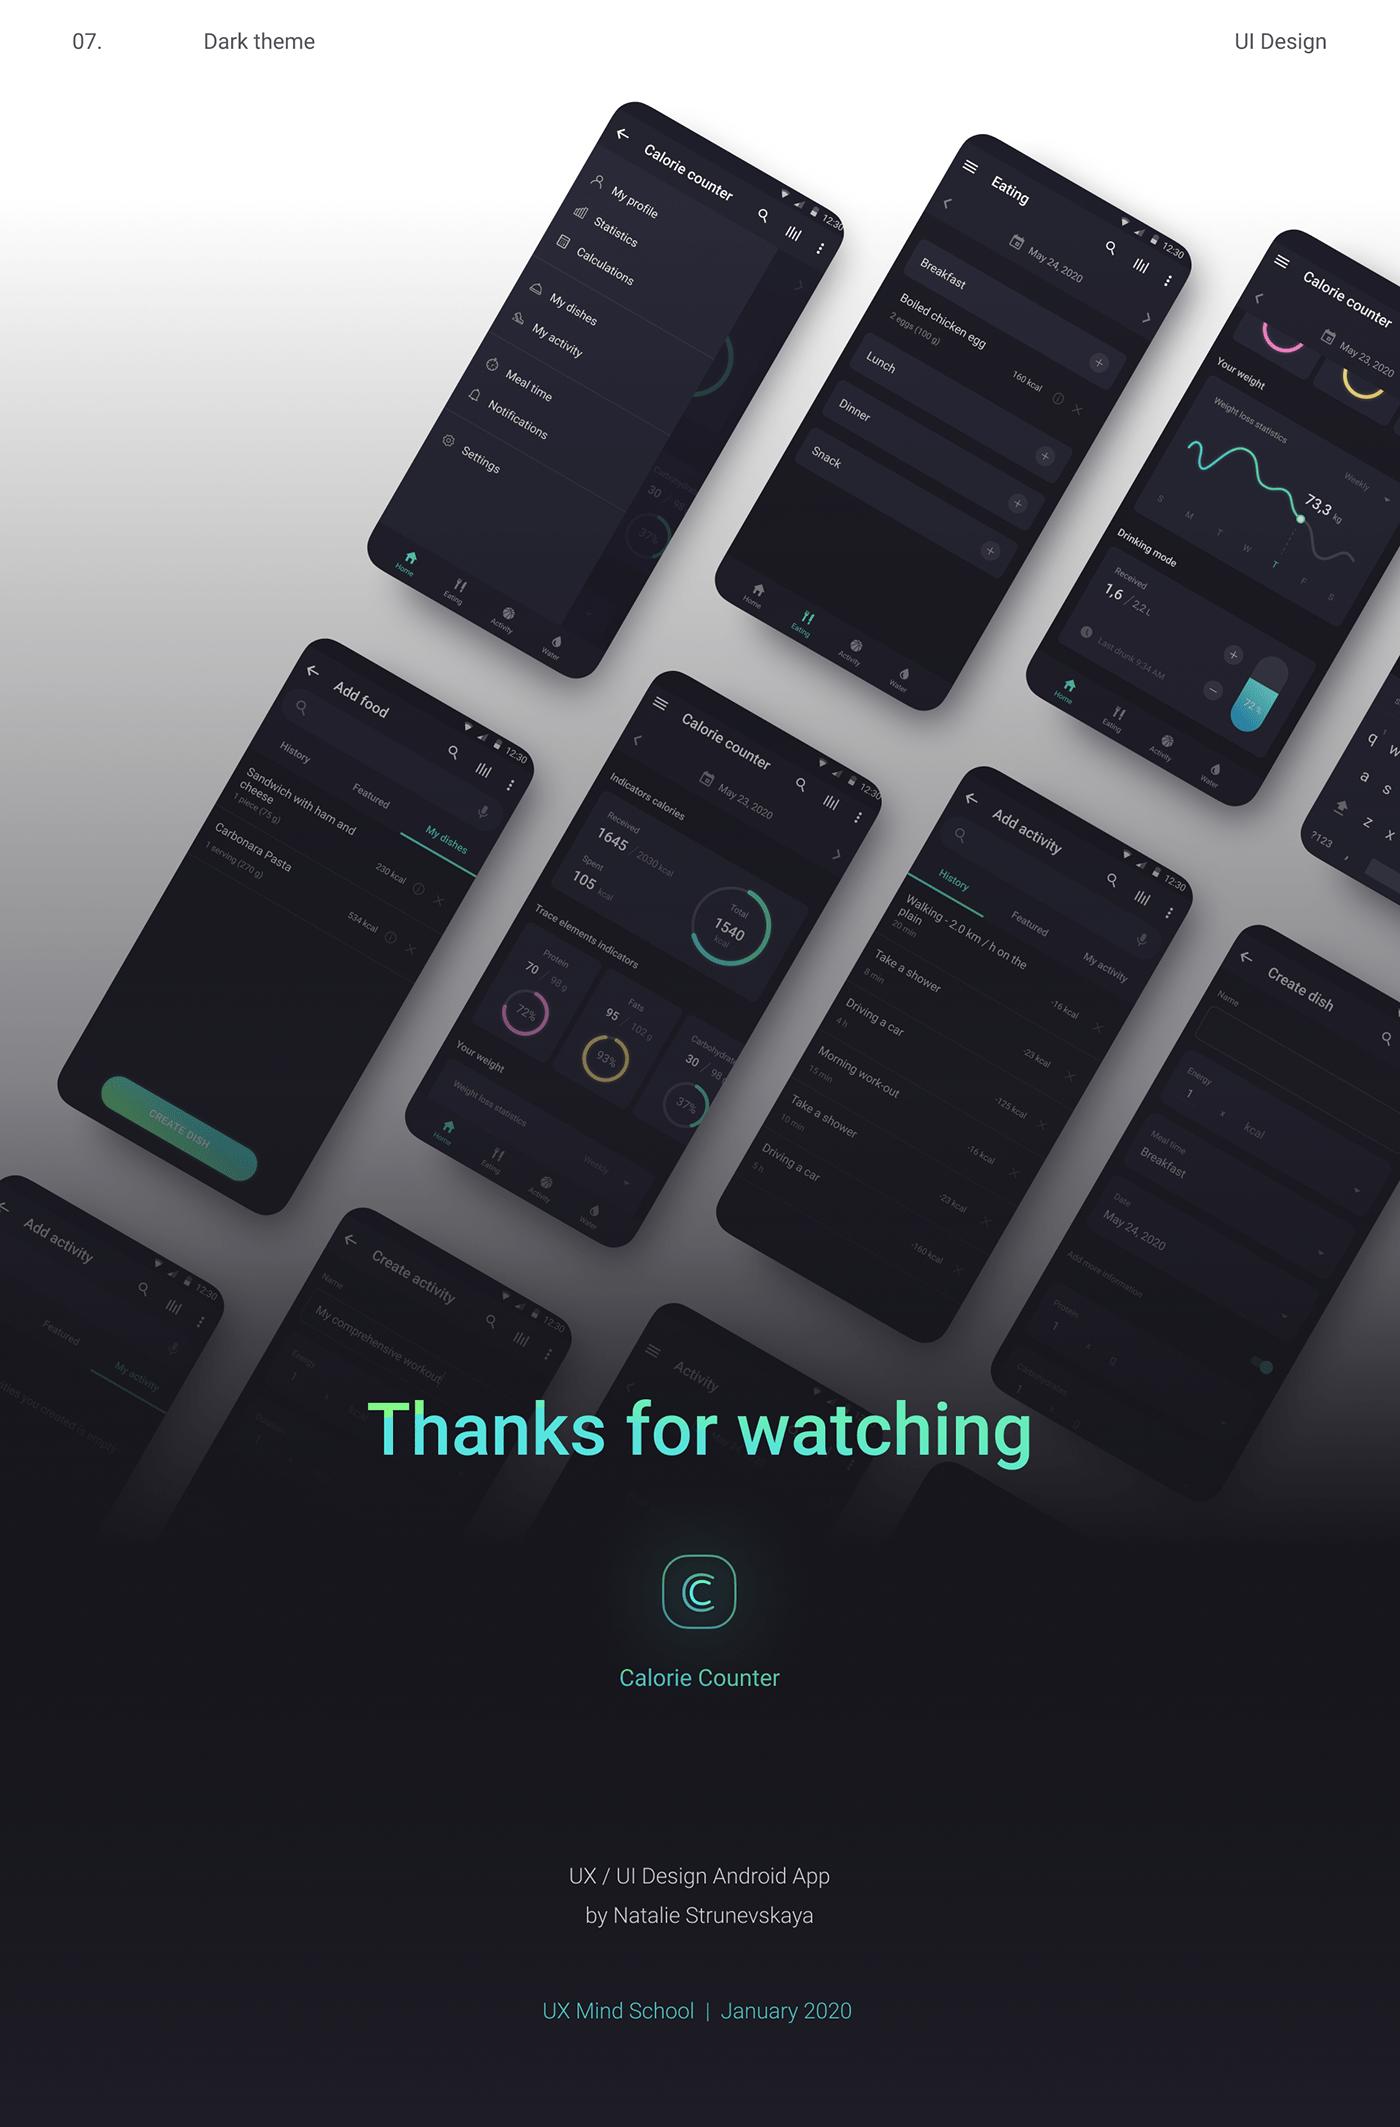 Mobile app android app ux UI calorie Interface dark theme UX / UI mobile app design